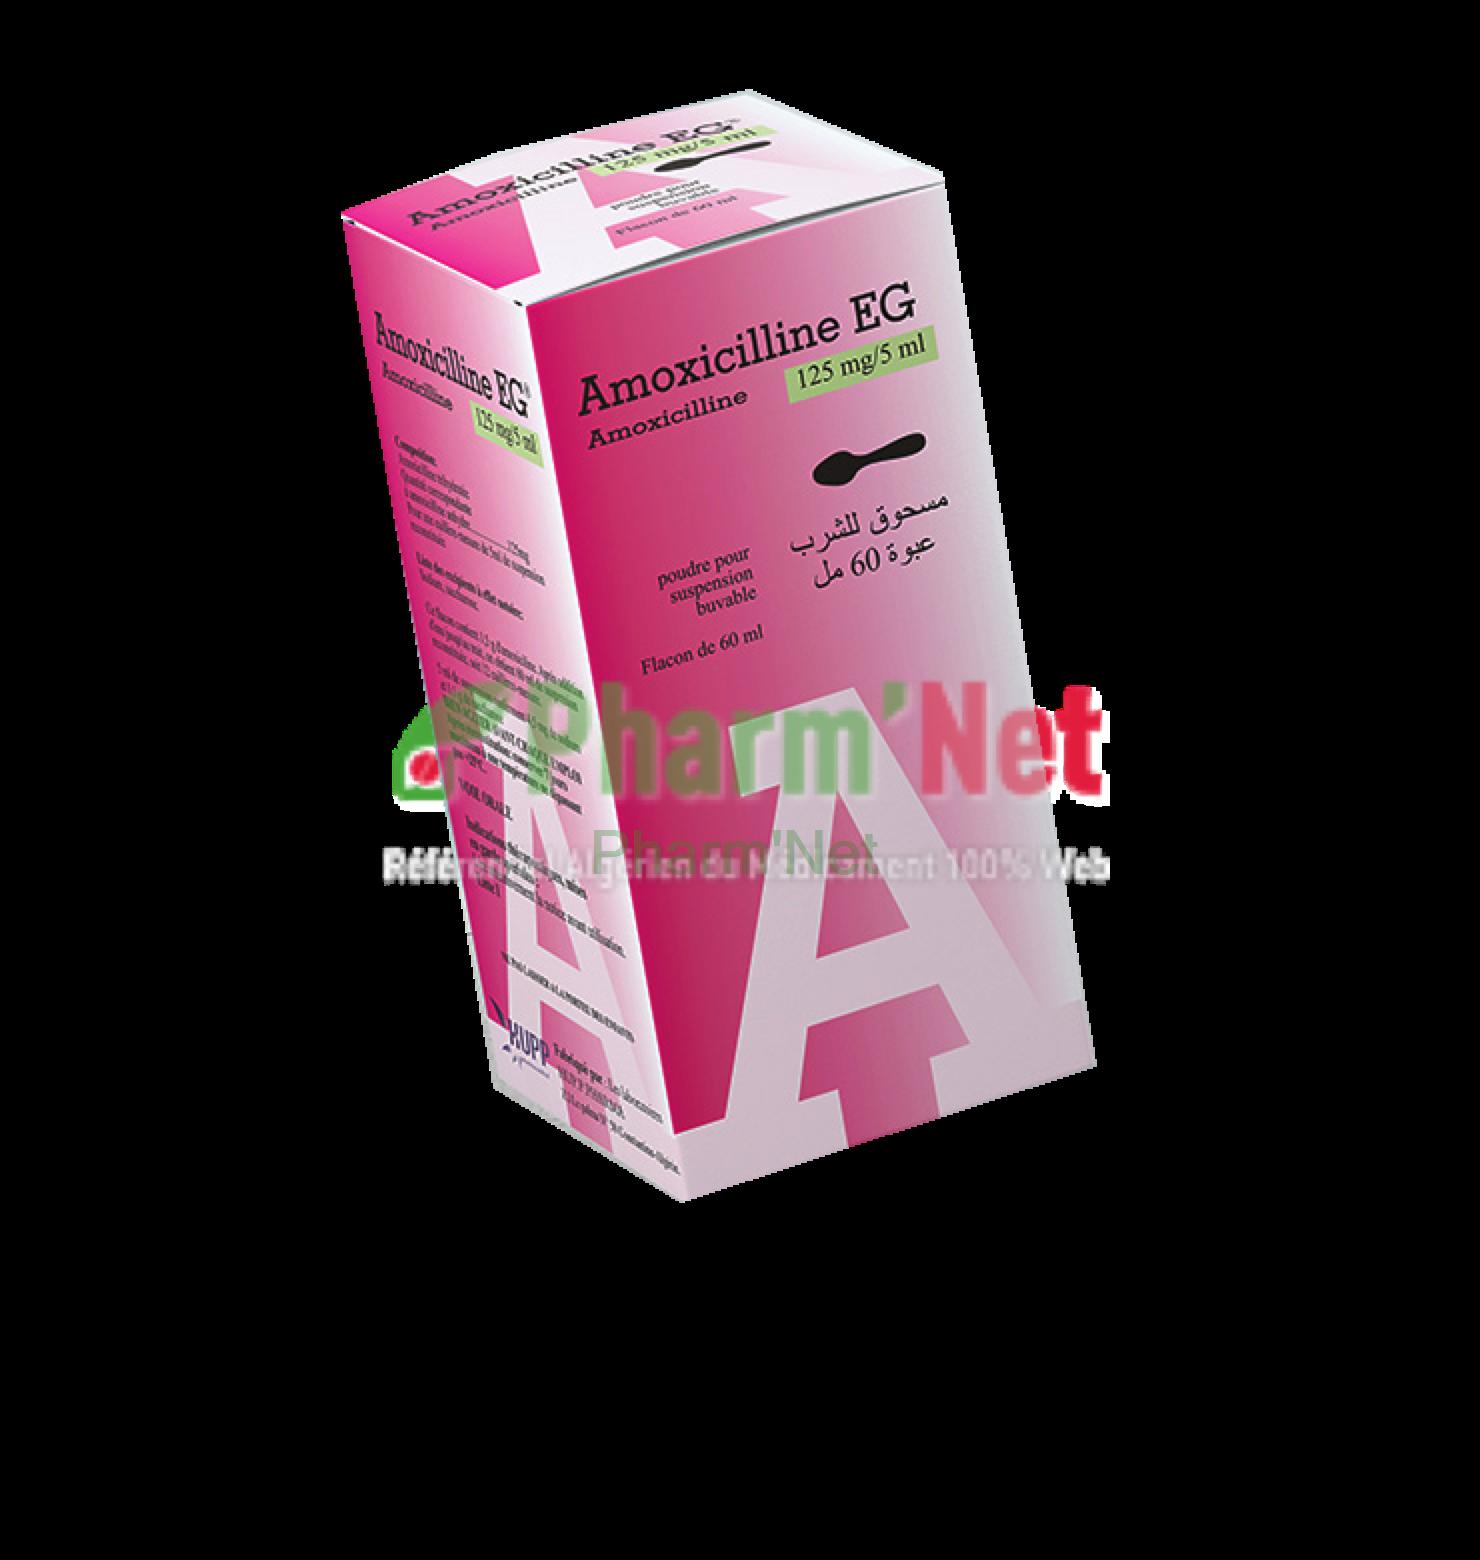 AMOXICILLINE EG 125MG/5ML PDRE  SUSP  BUV  FL /60ML